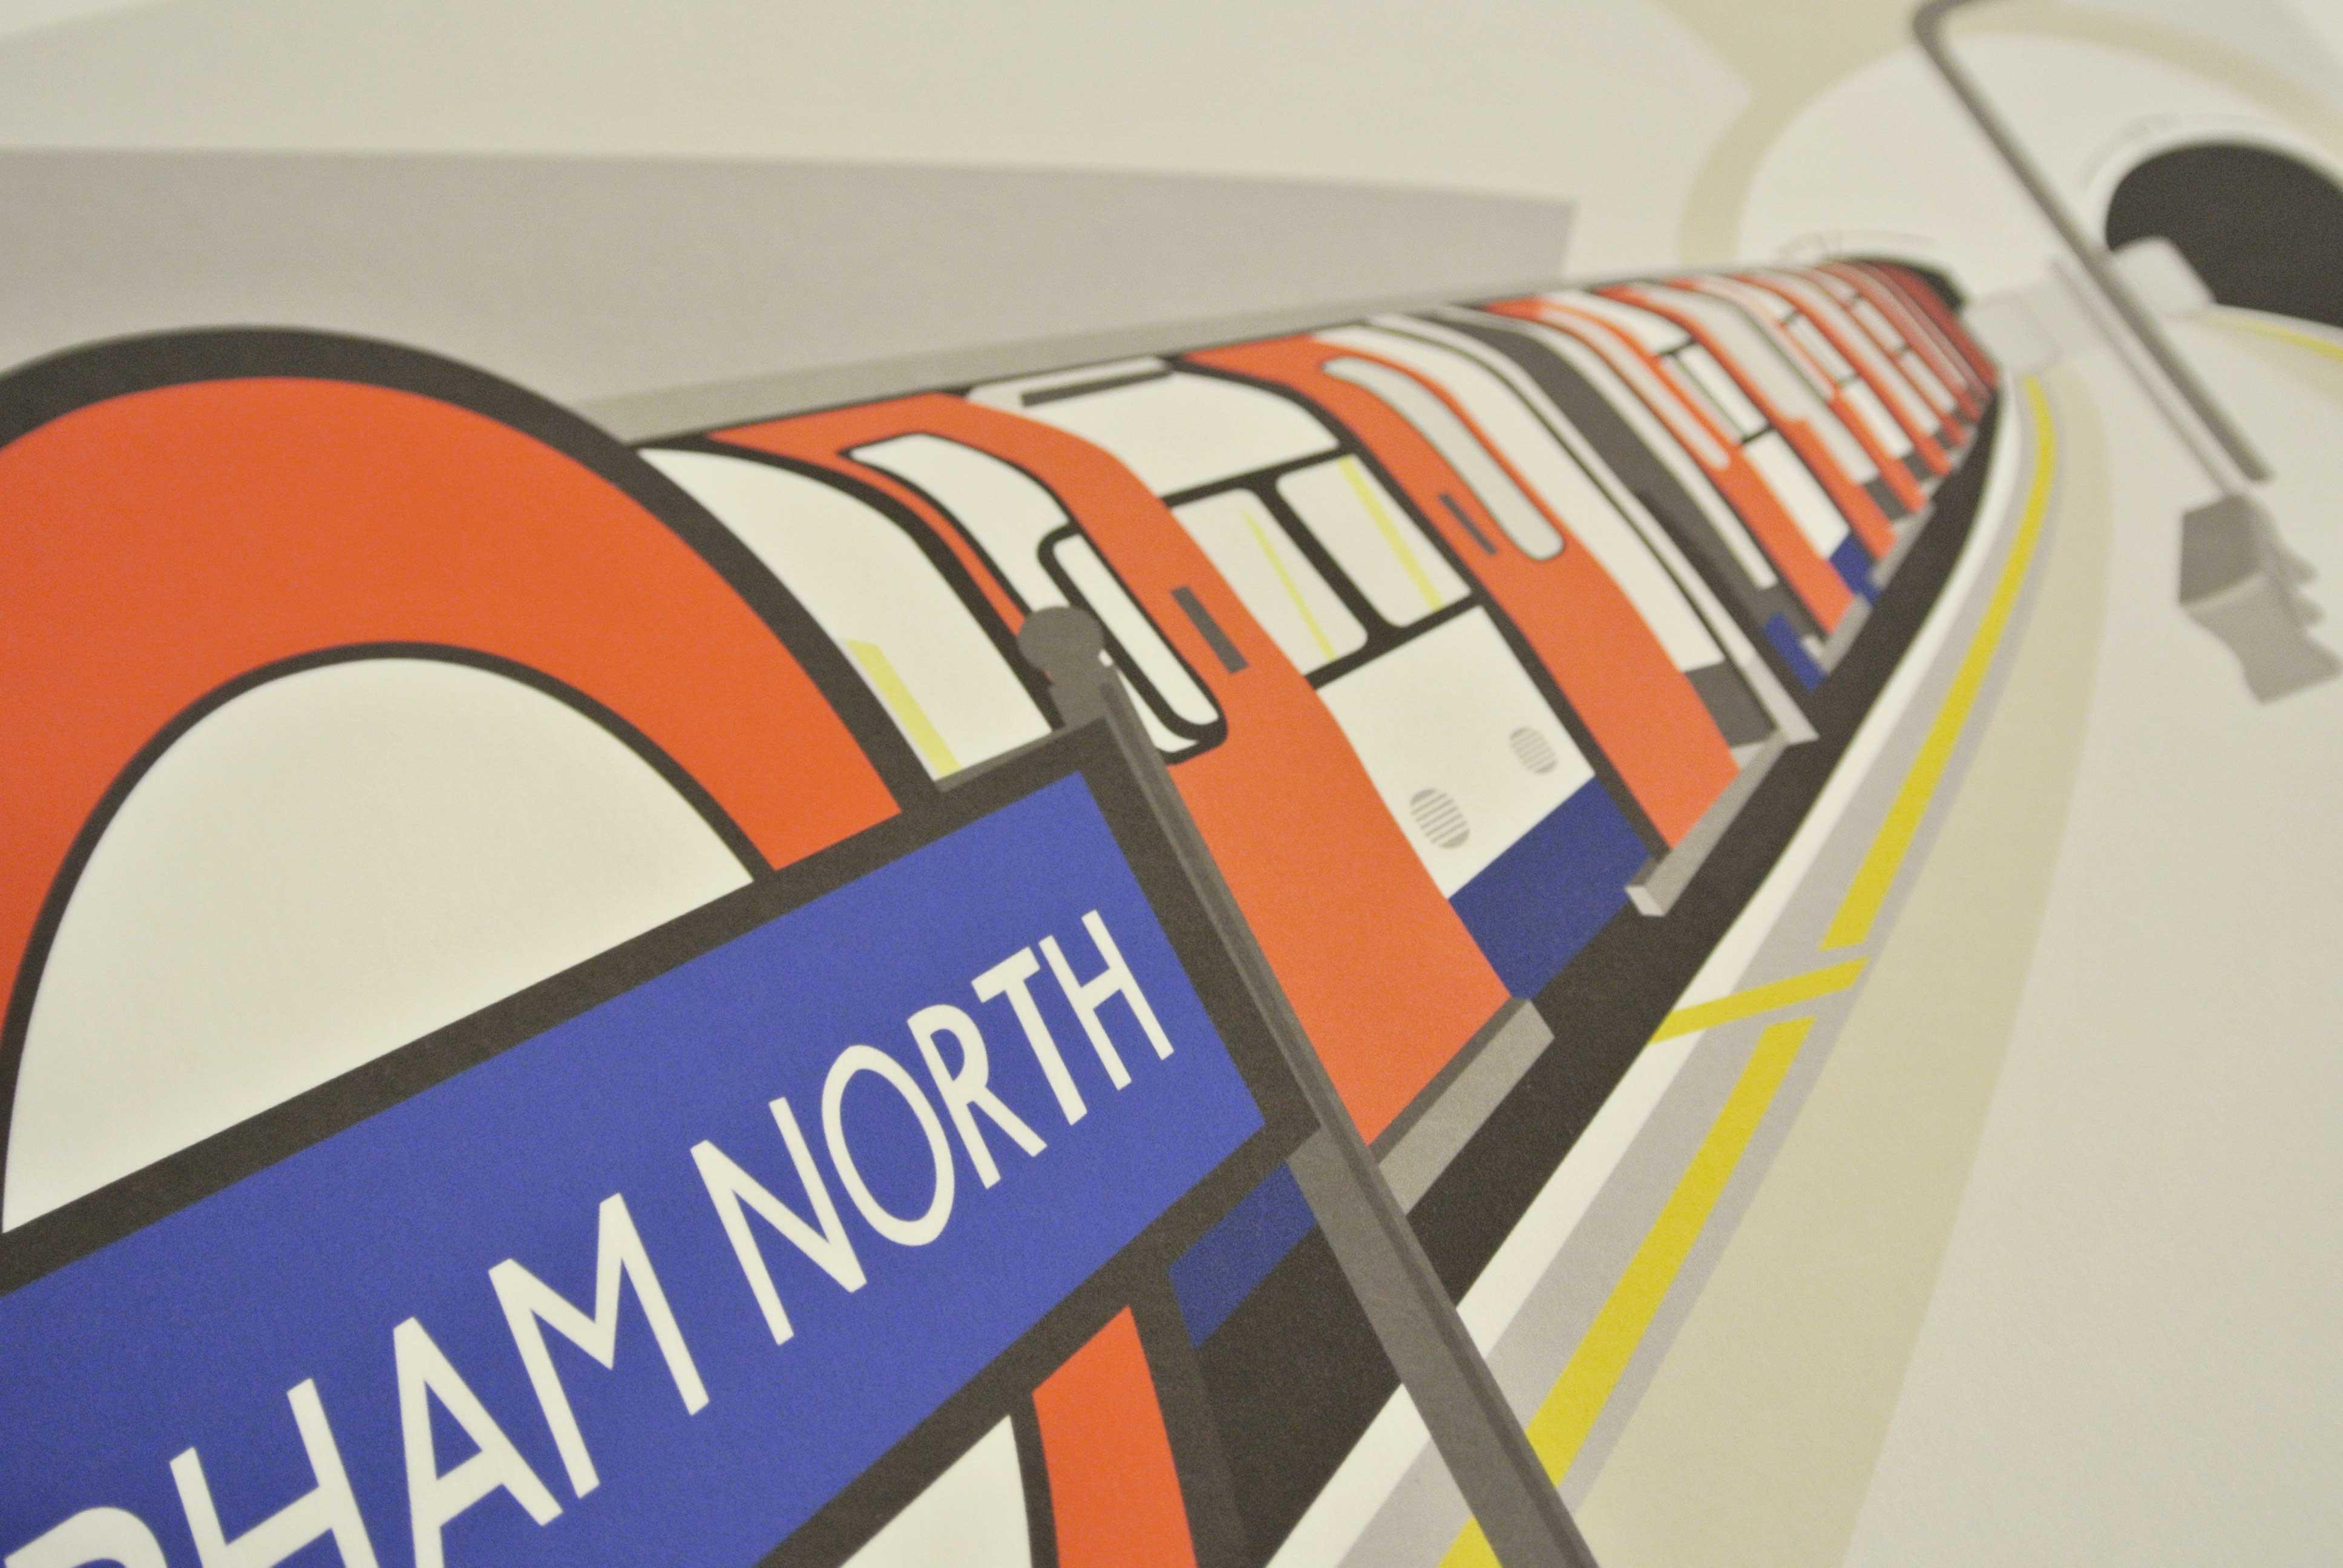 Place in Print South London Prints Clapham North Station Platform Art Print Photo